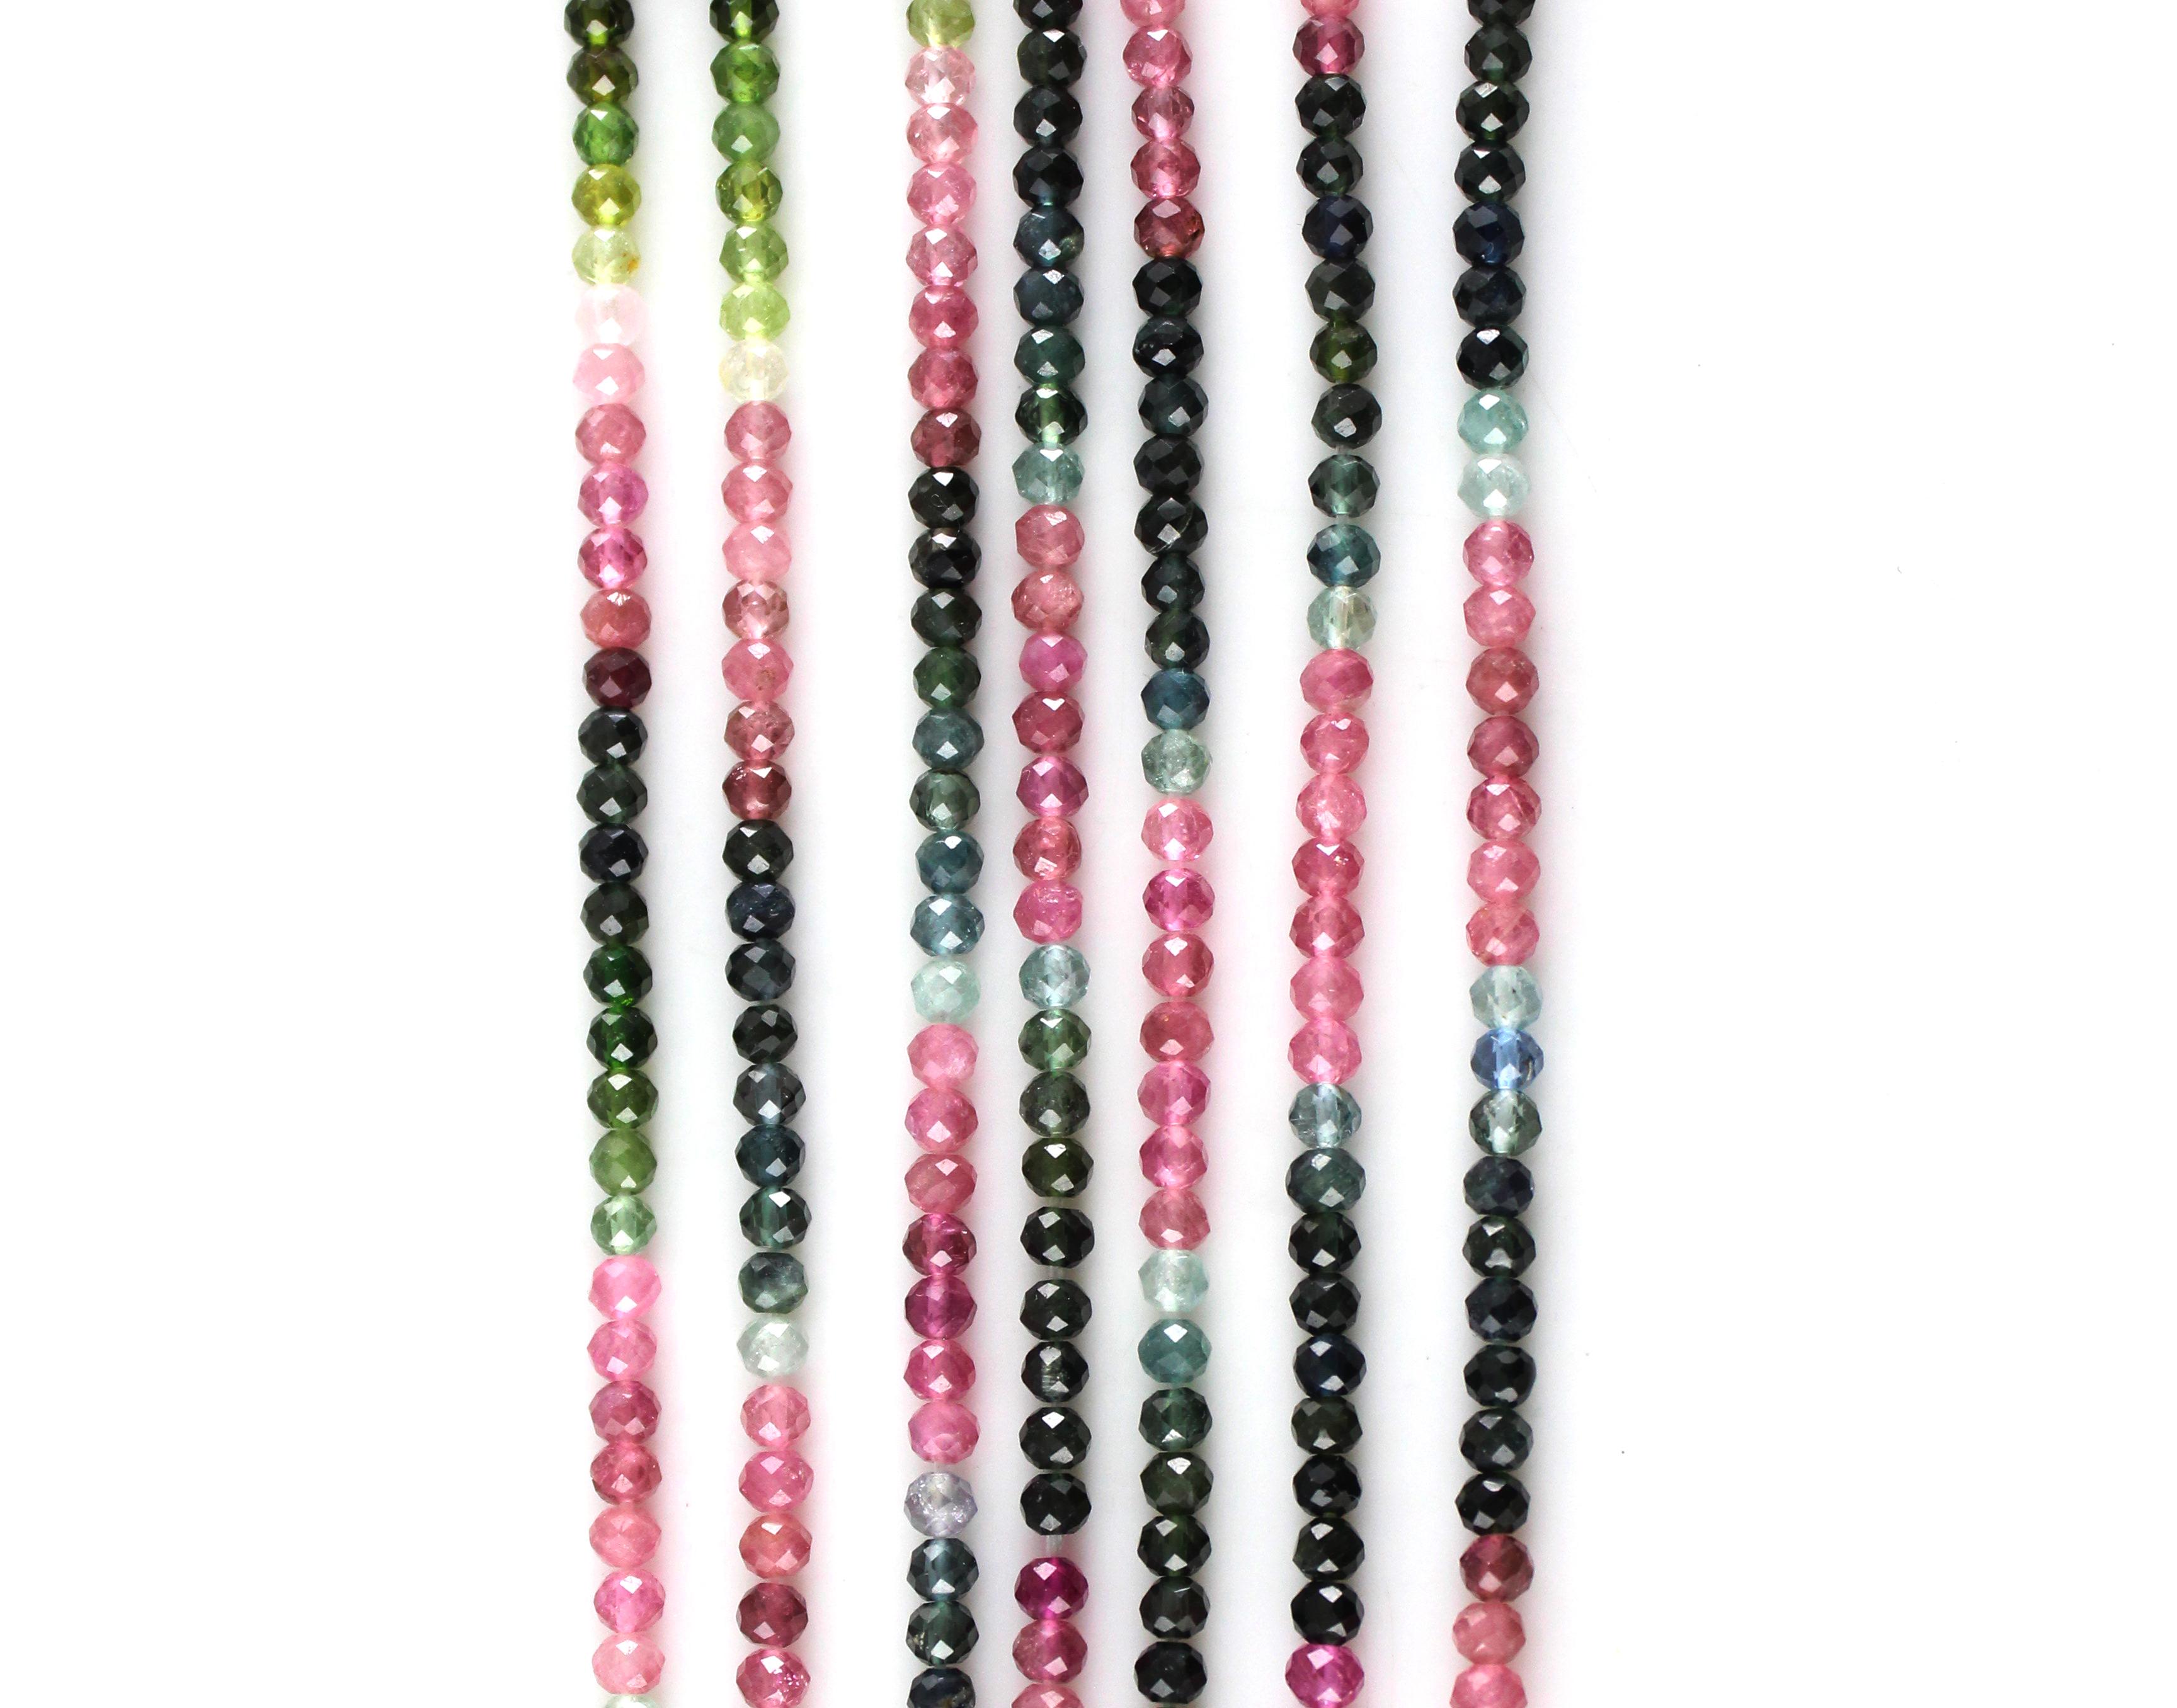 Tourmaline Micro Beads